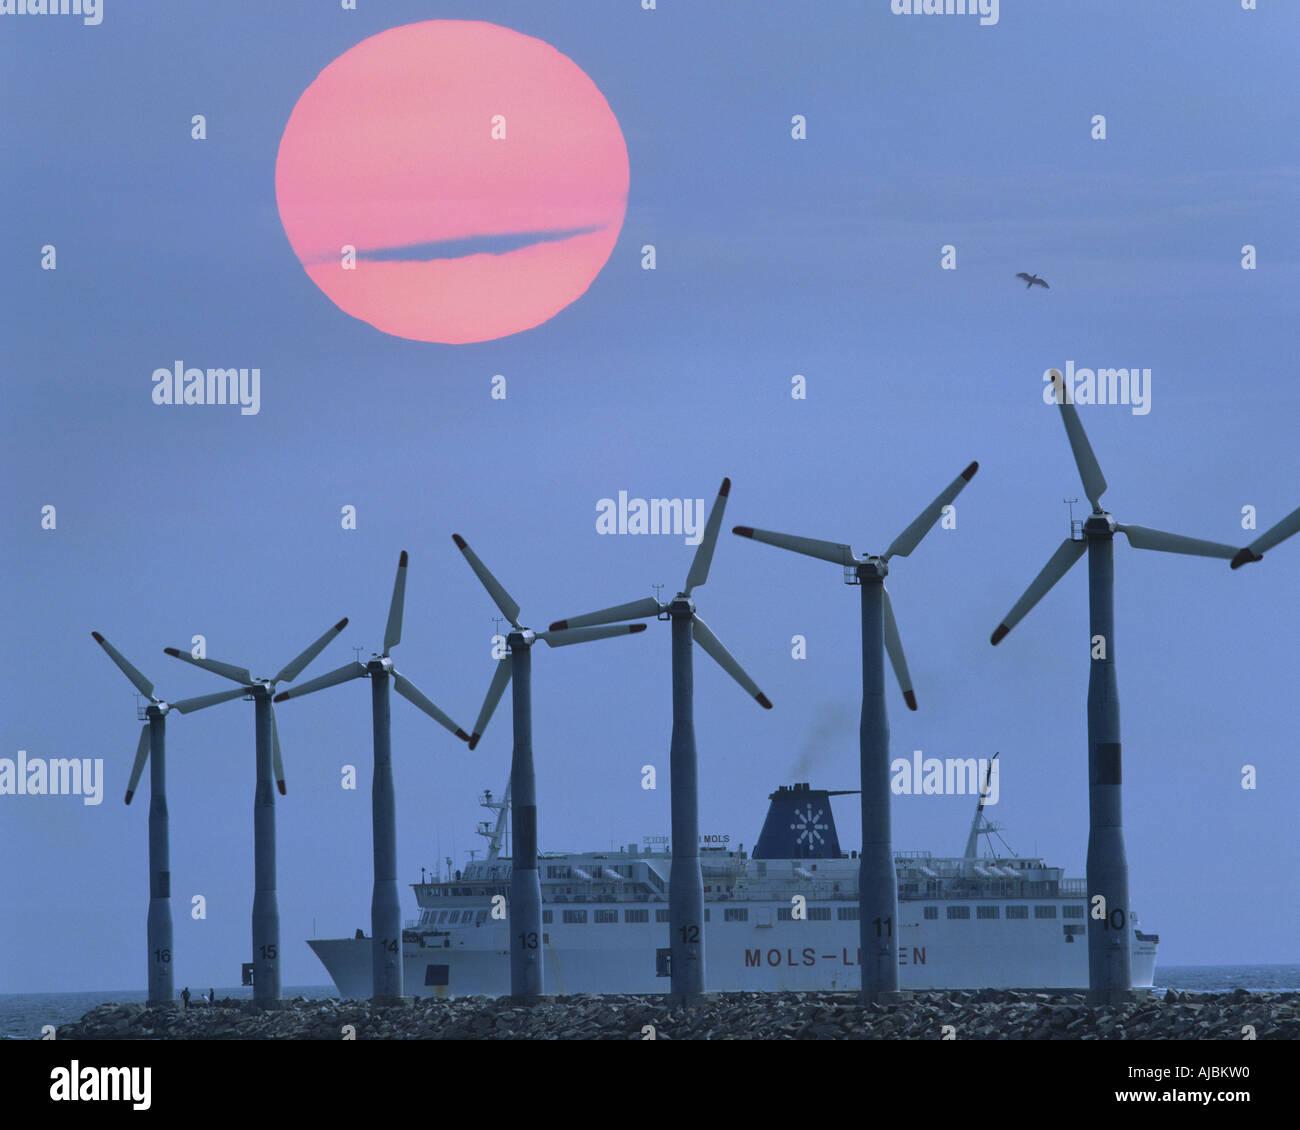 DK - Jutlandia: Las turbinas eólicas en Ebeltoft Imagen De Stock